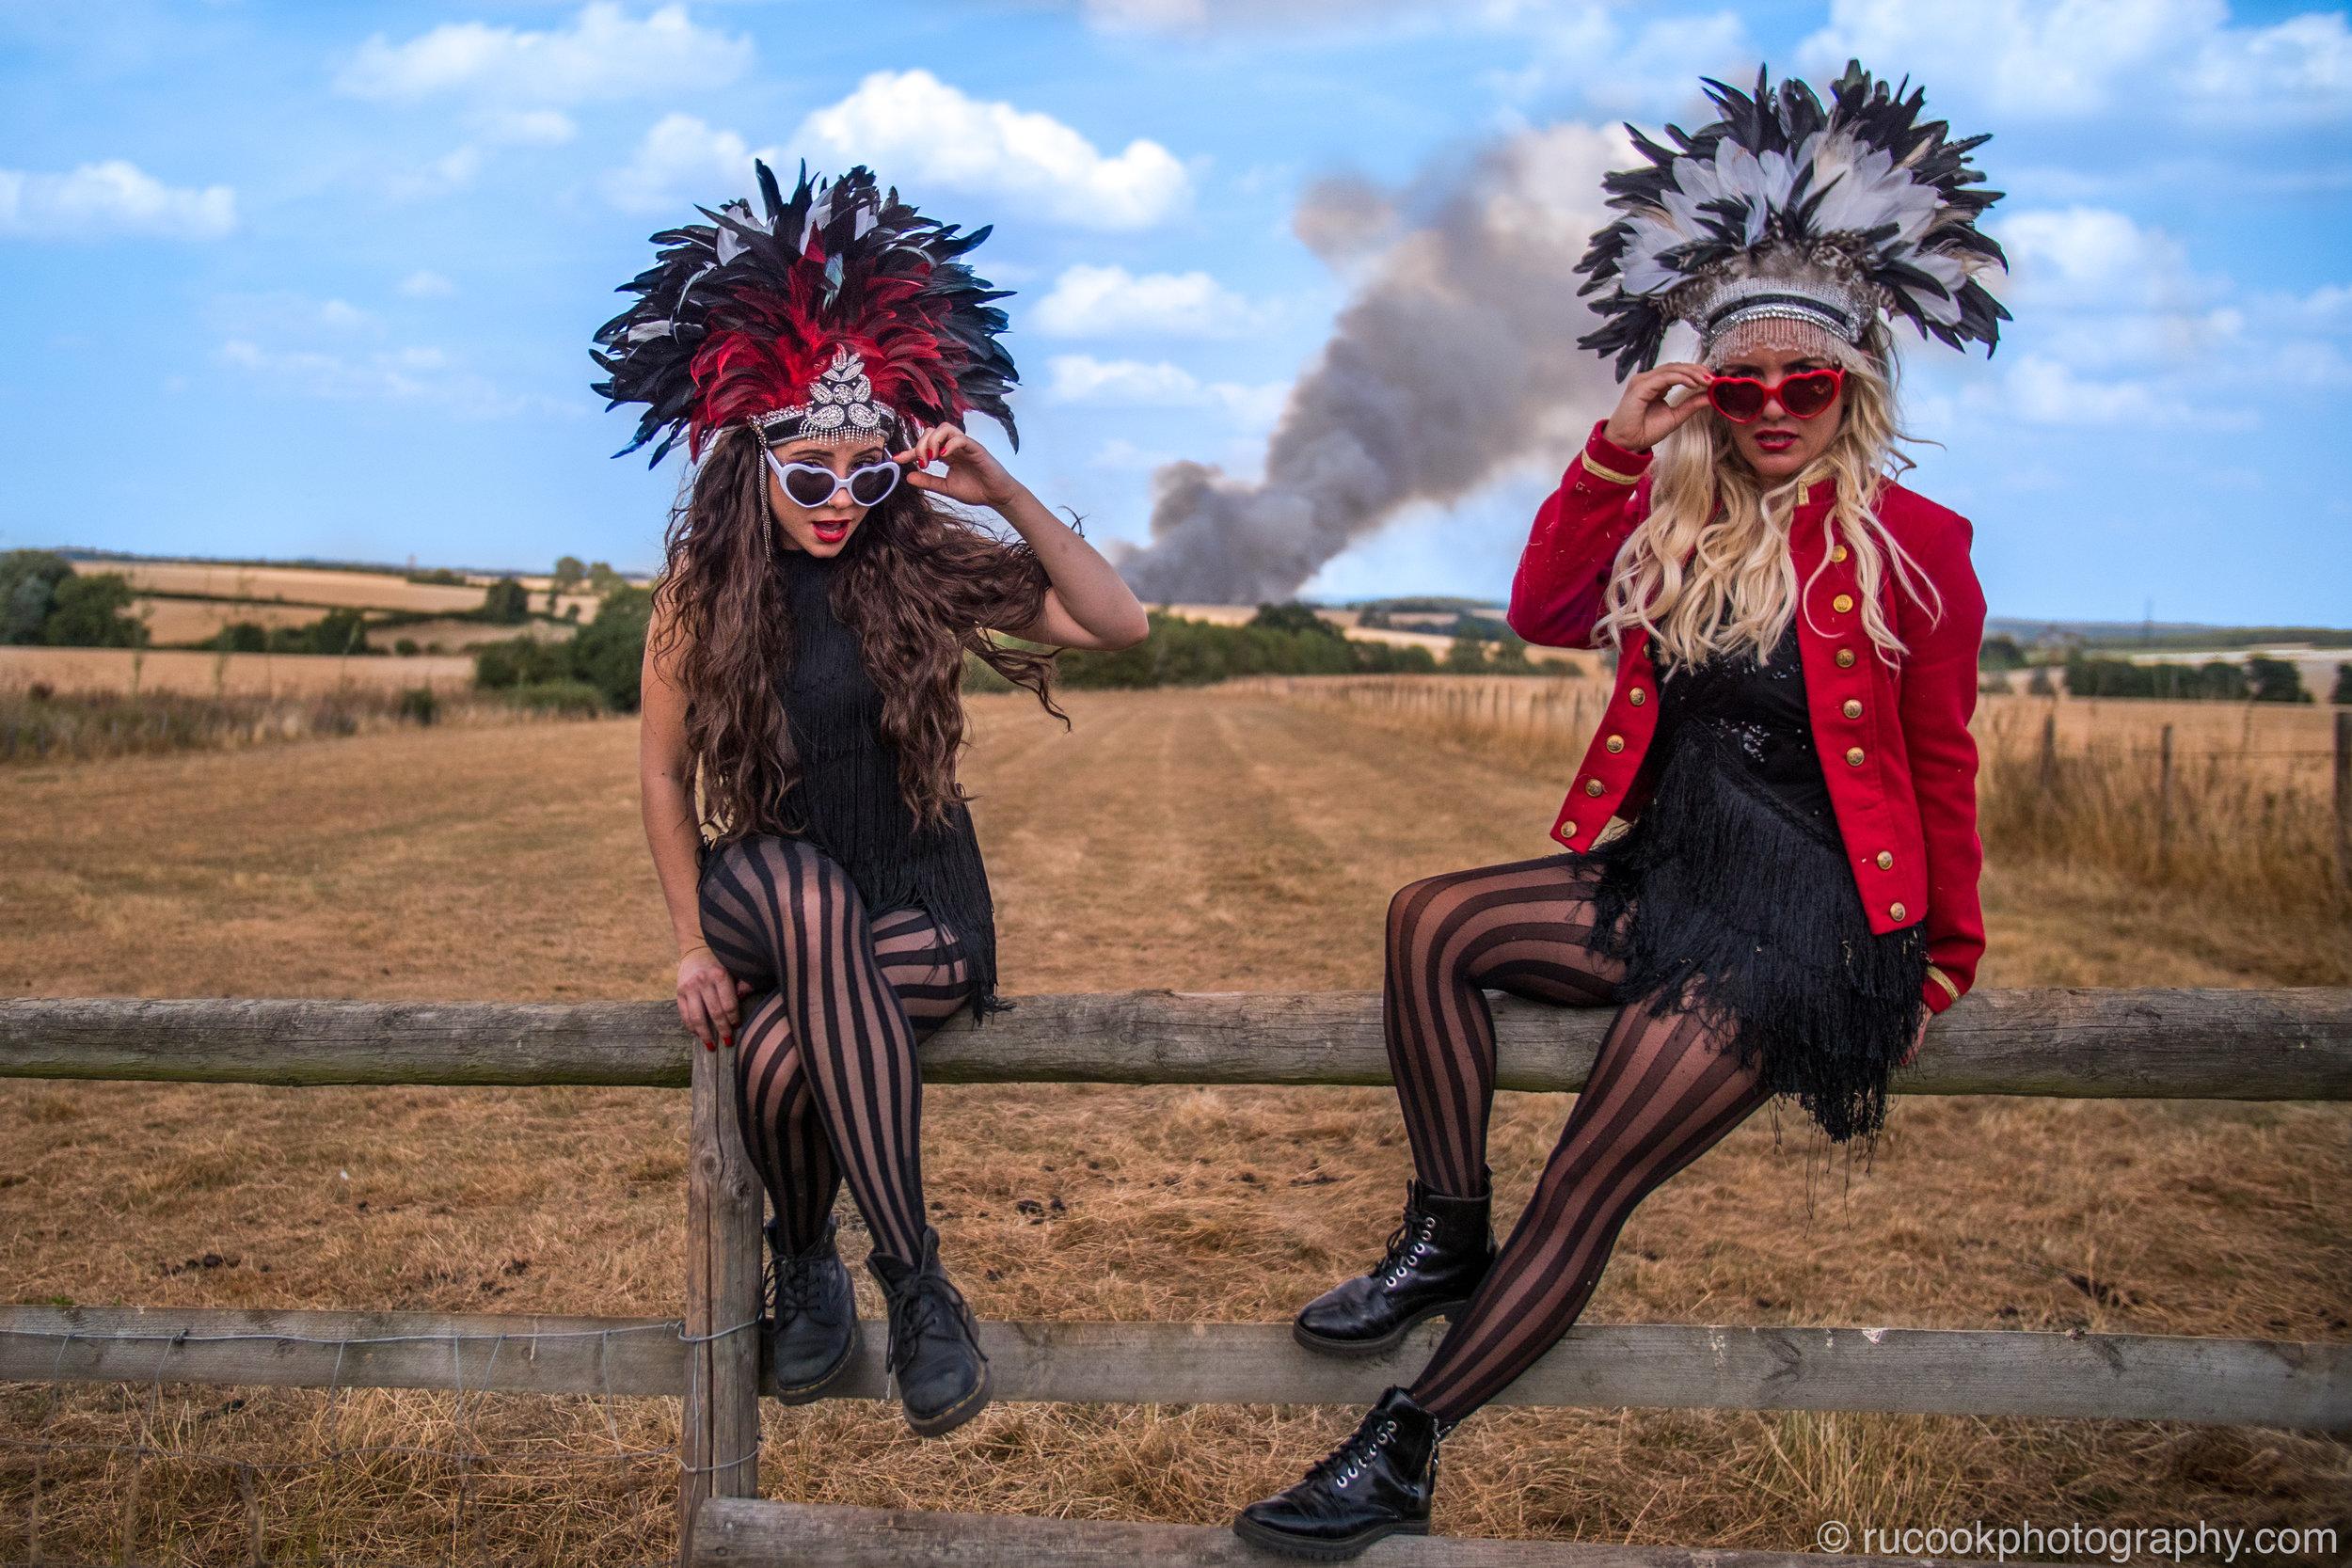 Models: Vicki Olivia & Fiona Salomon